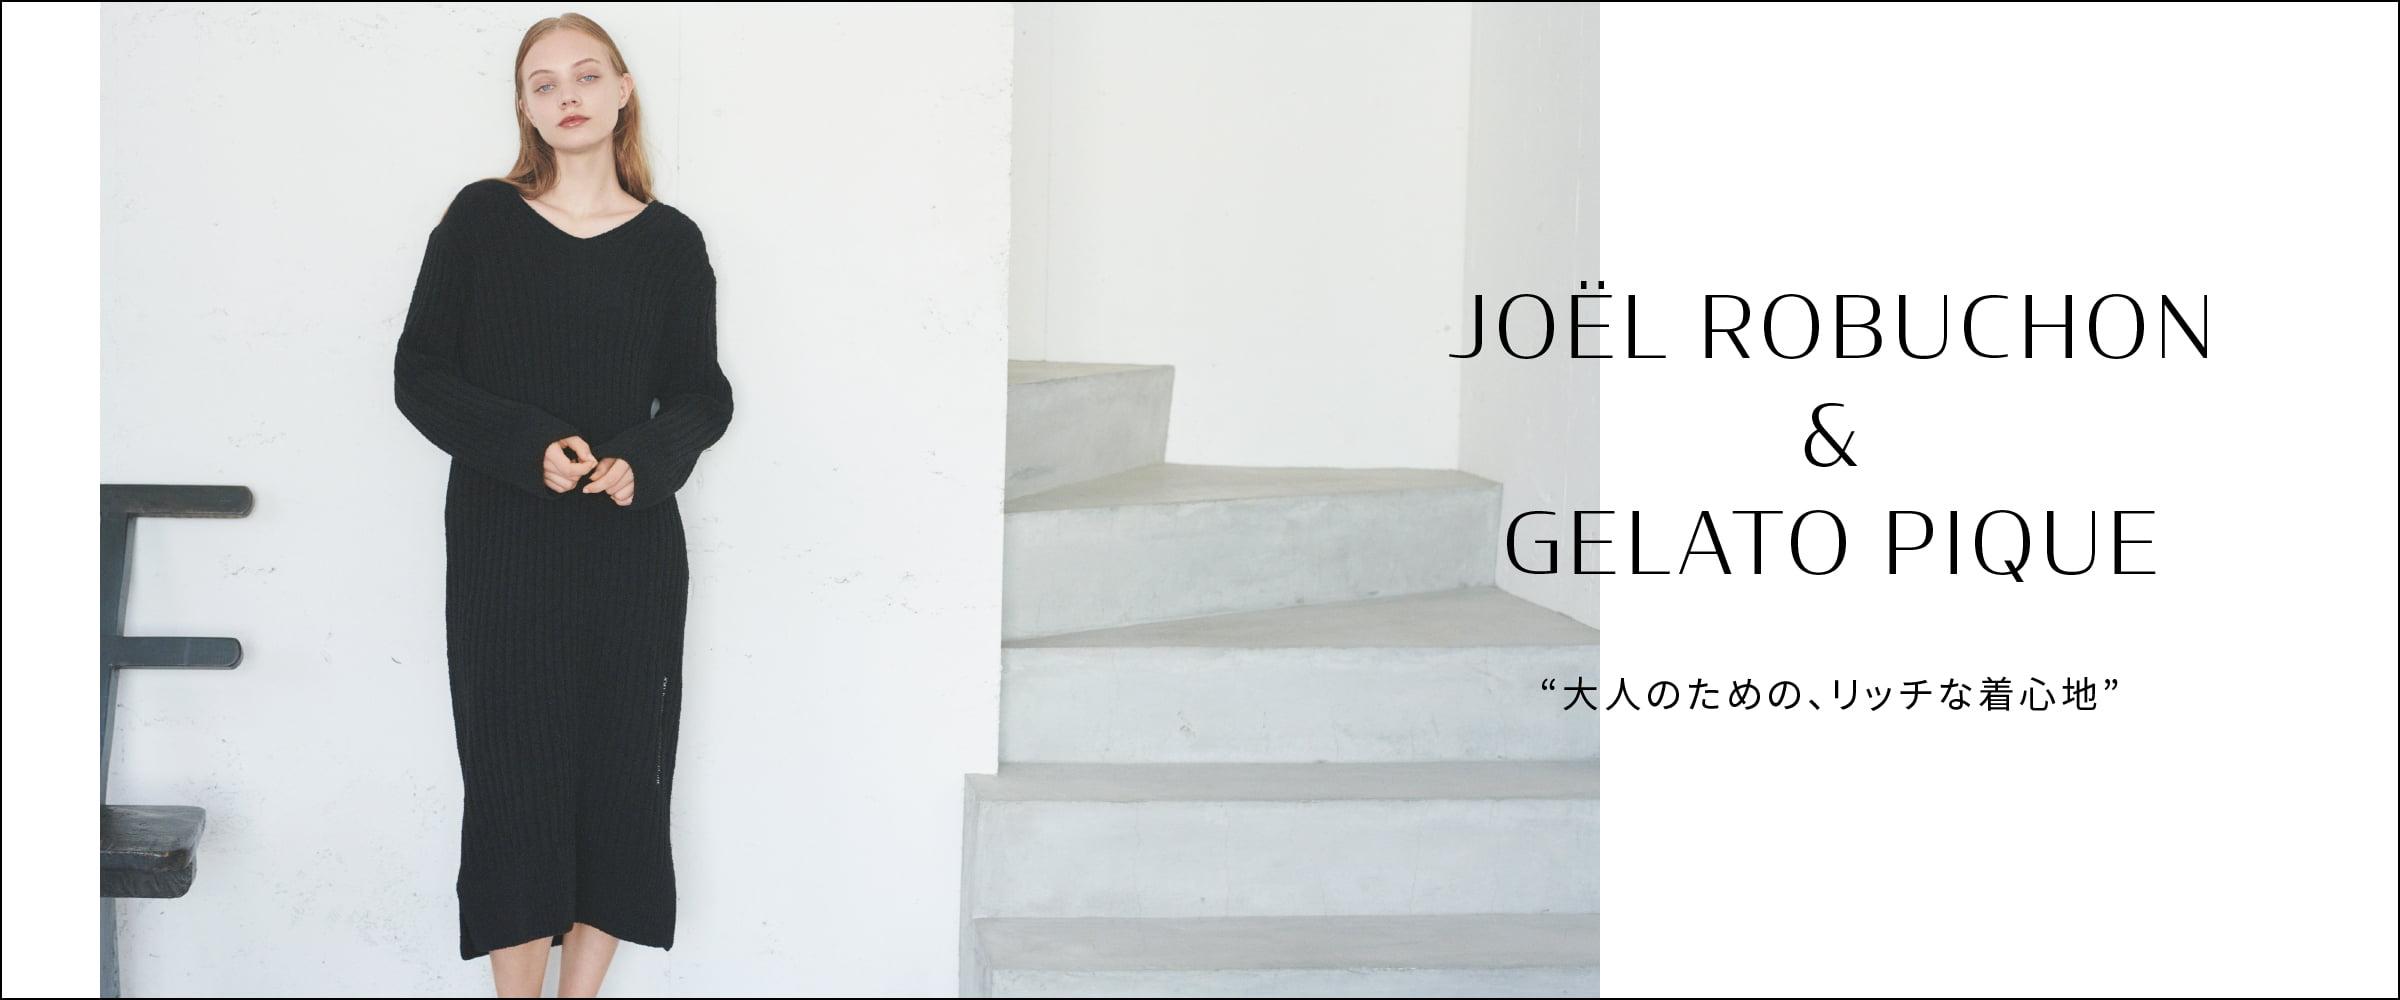 "JOËL ROBUCHON & GELATO PIQUE ""大人のための、リッチな着心地"""